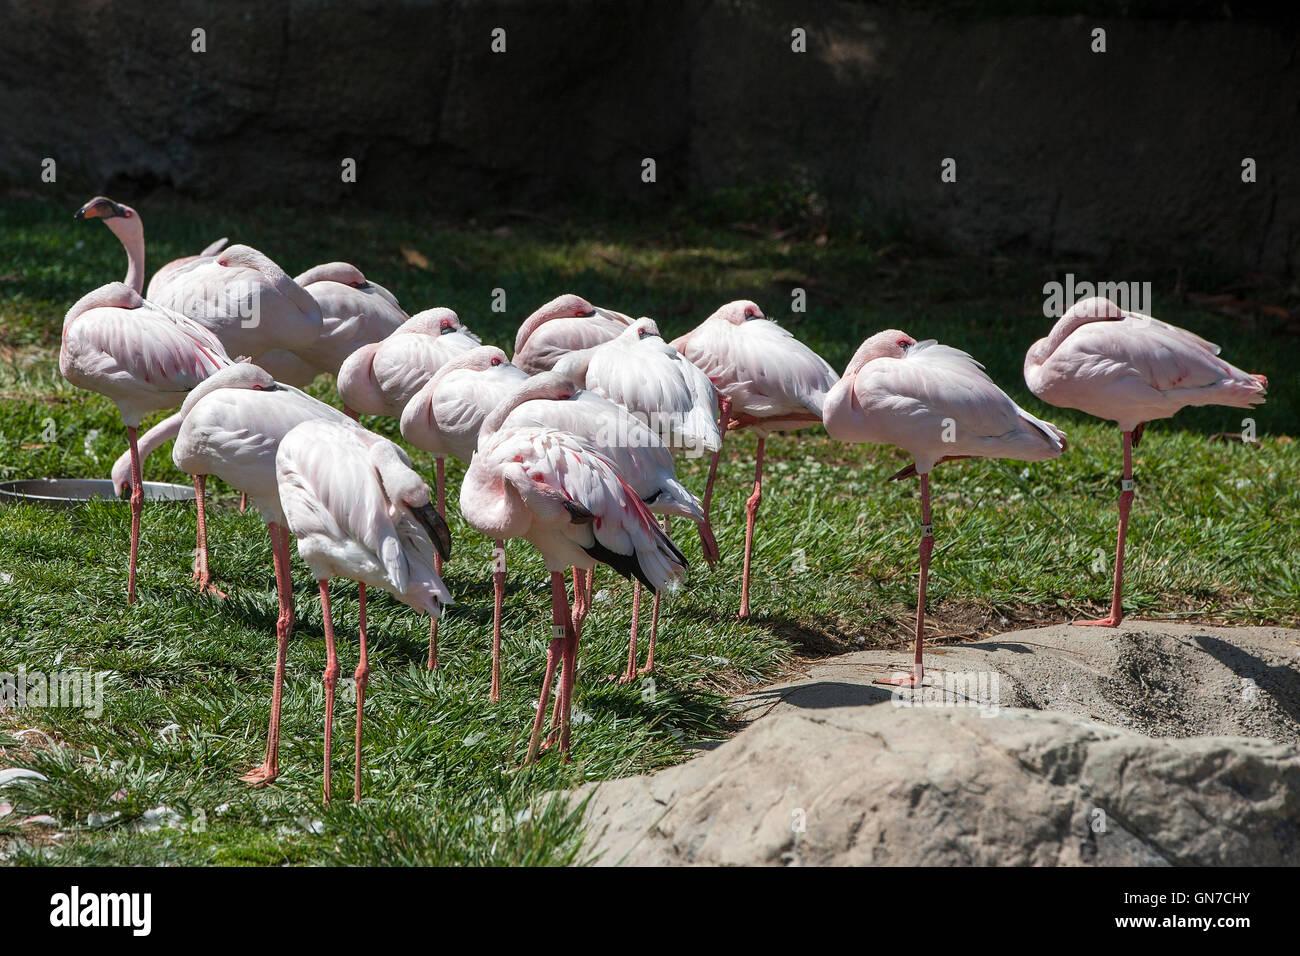 Lesser Flamingo (Phoeniconaias minor), Oakland Zoo, Oakland, California, United States of America Stock Photo